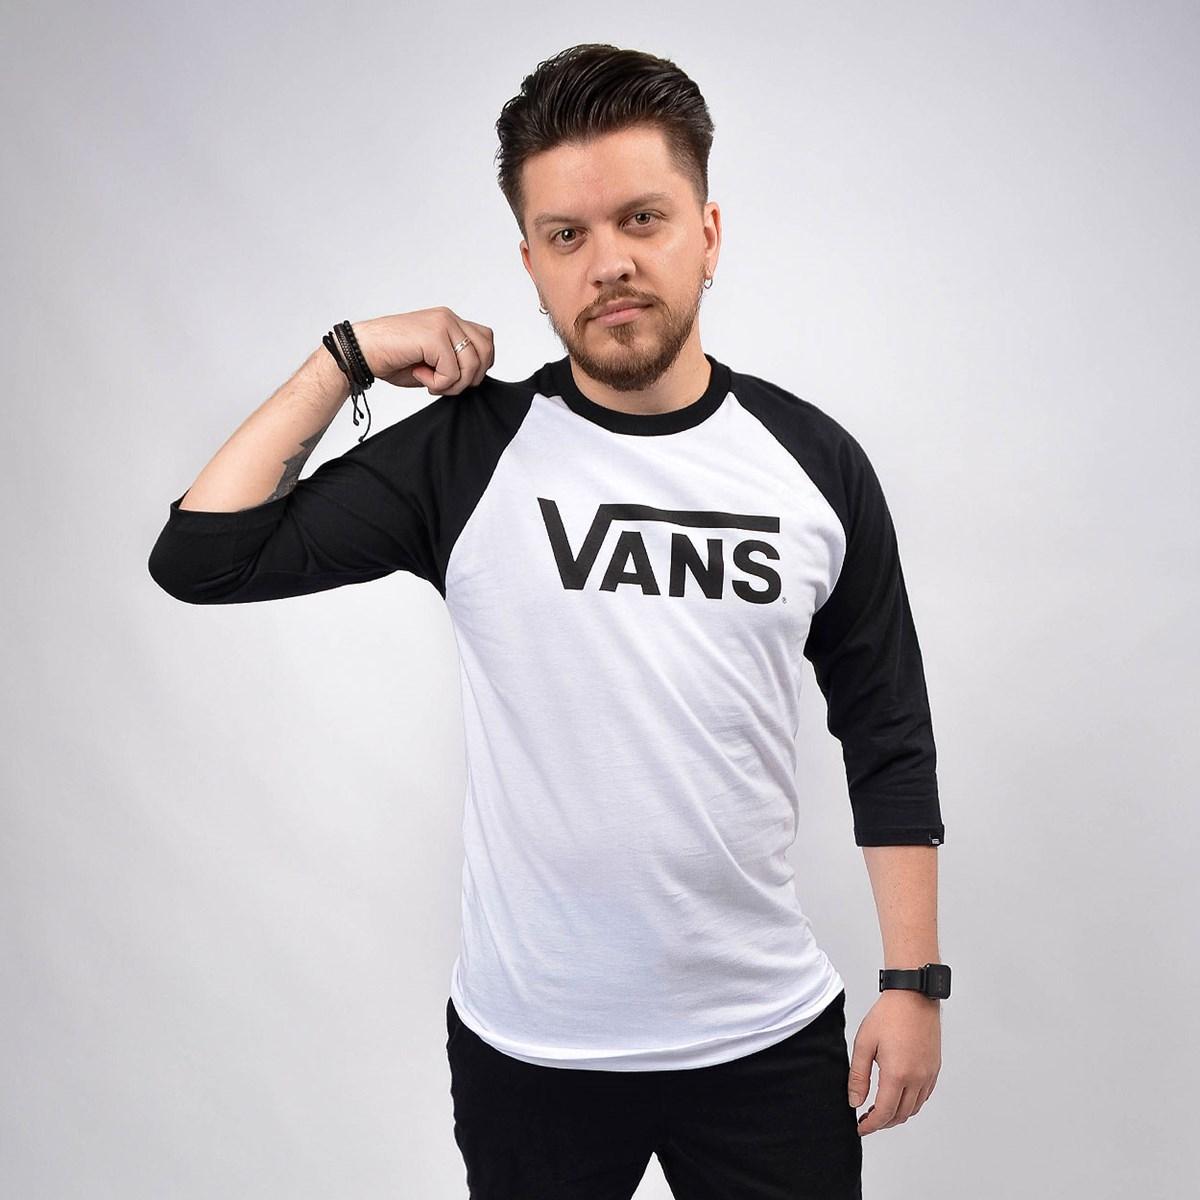 Camiseta Vans Masculina Classic Raglan White Black VN0A4A59YB2 White Black